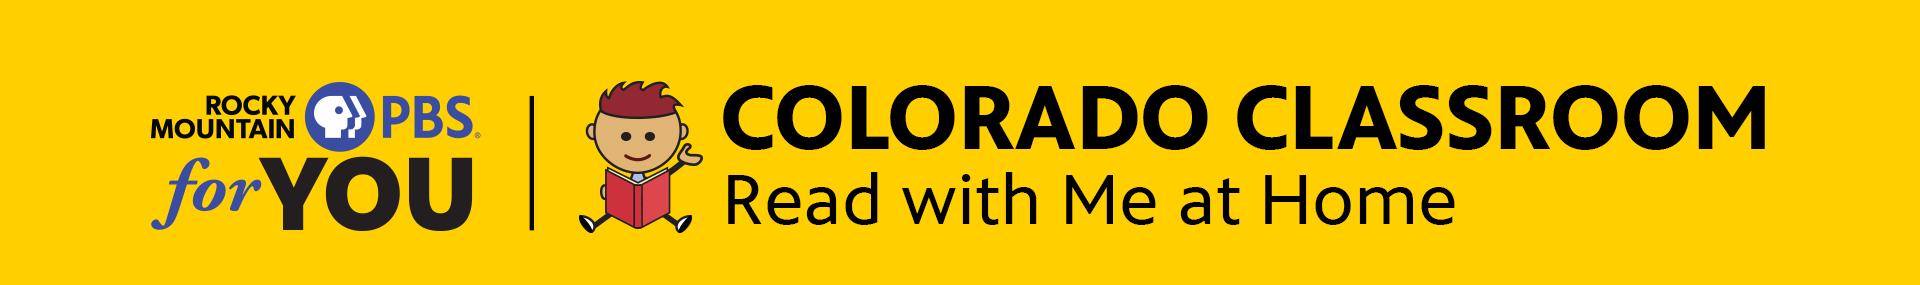 Colorado Classroom Banner